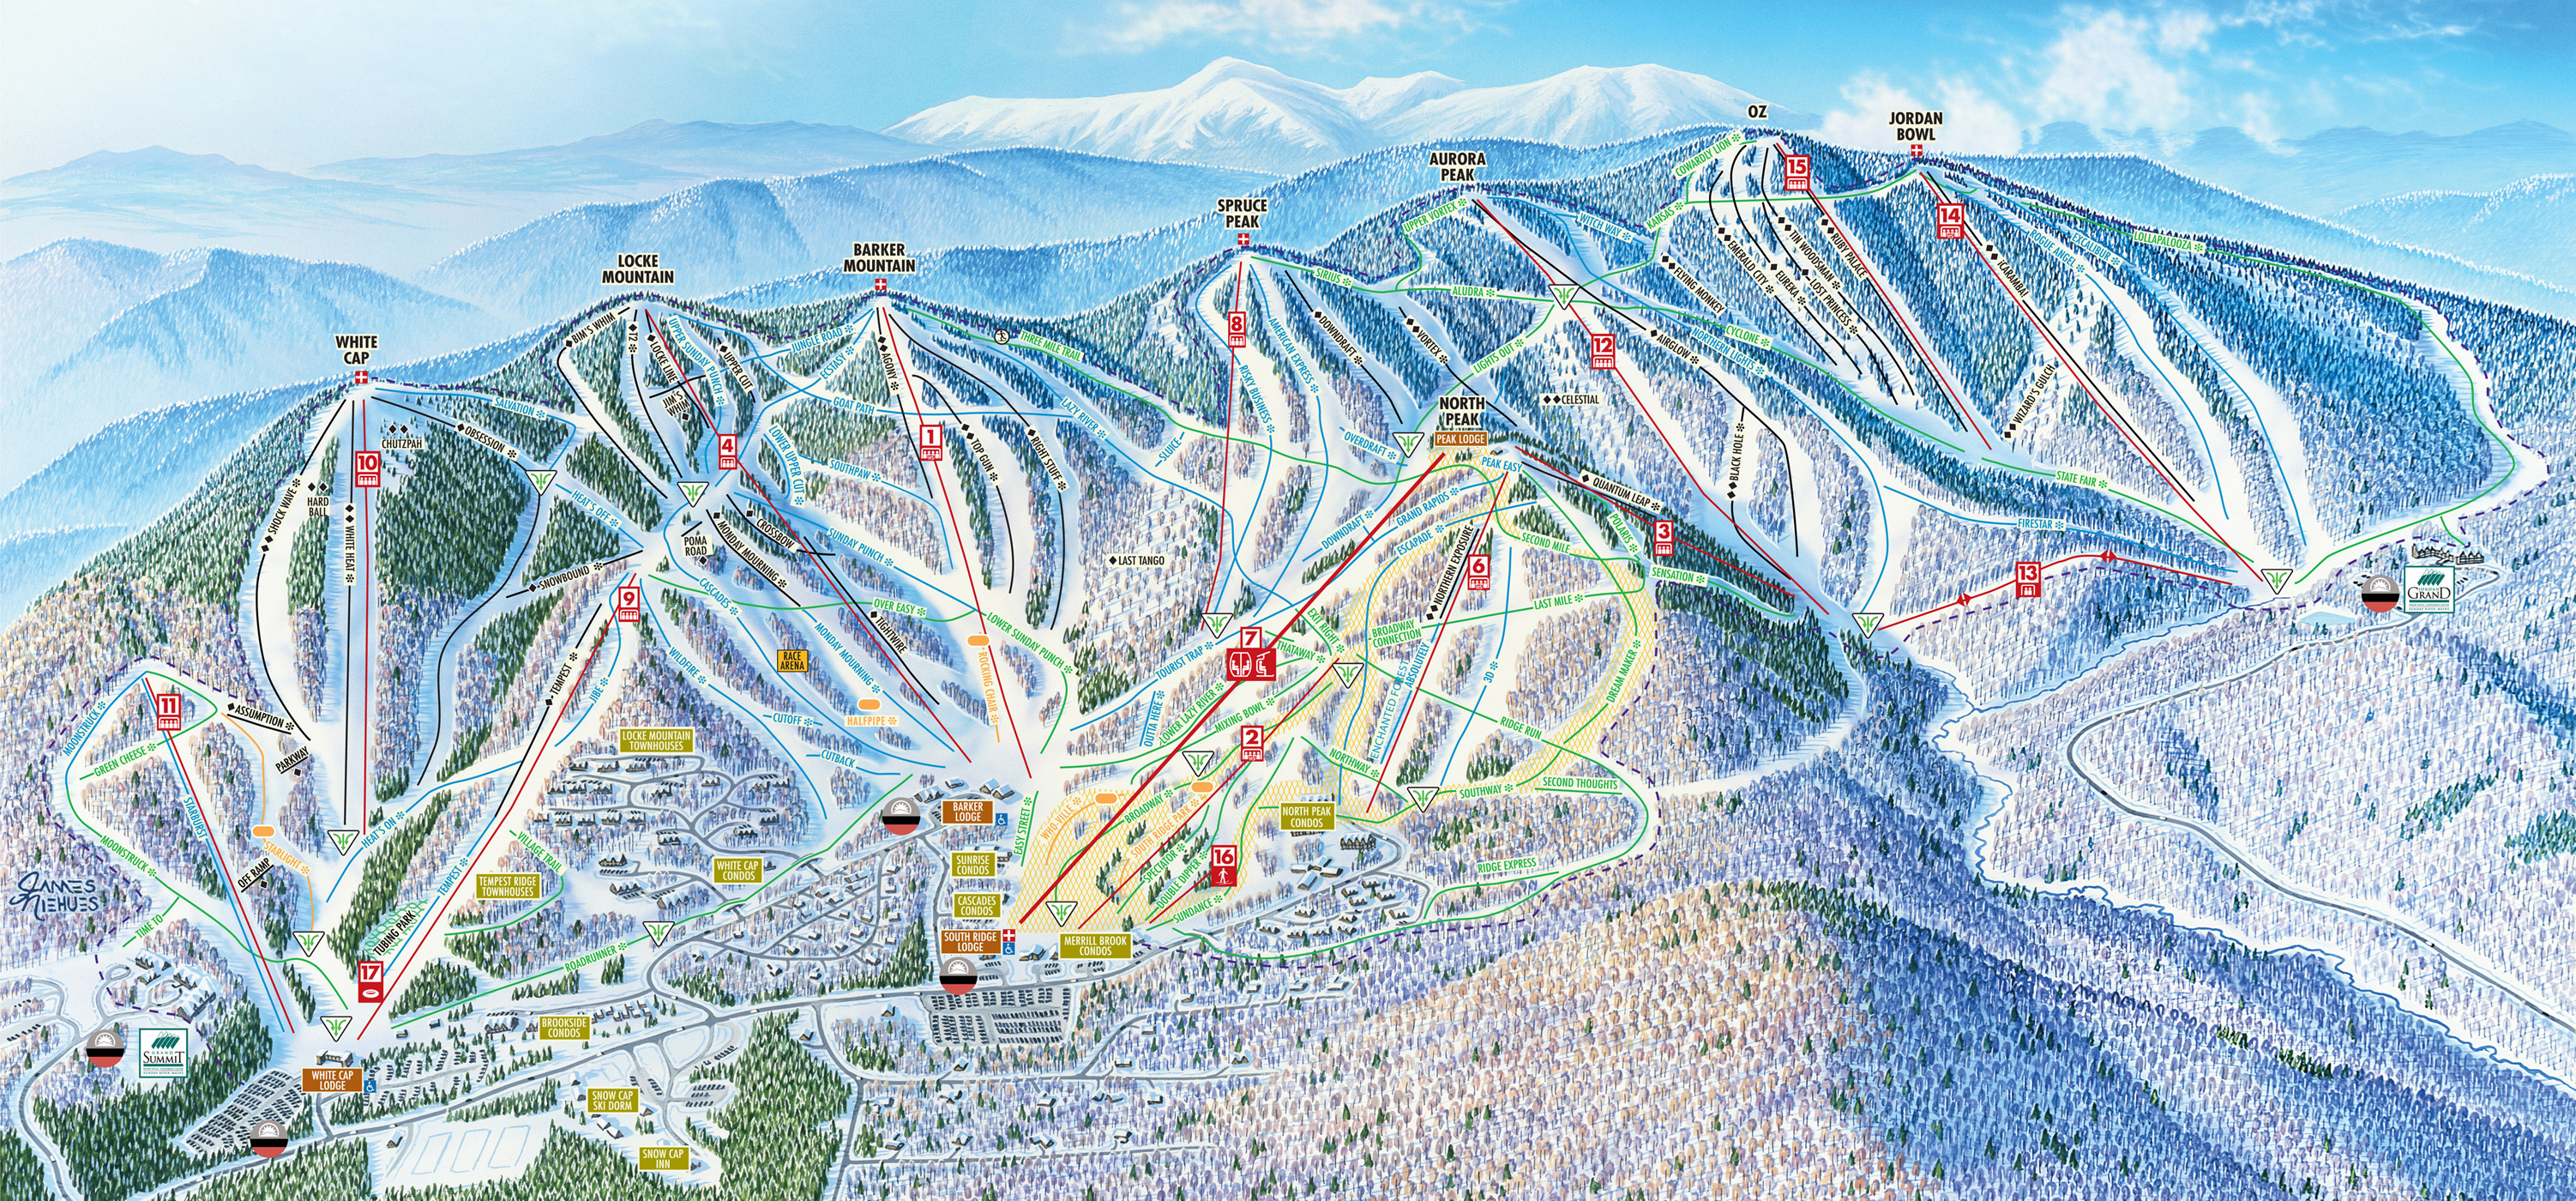 Sunday River Ski Resort Ski Trail Map Newry Maine United States